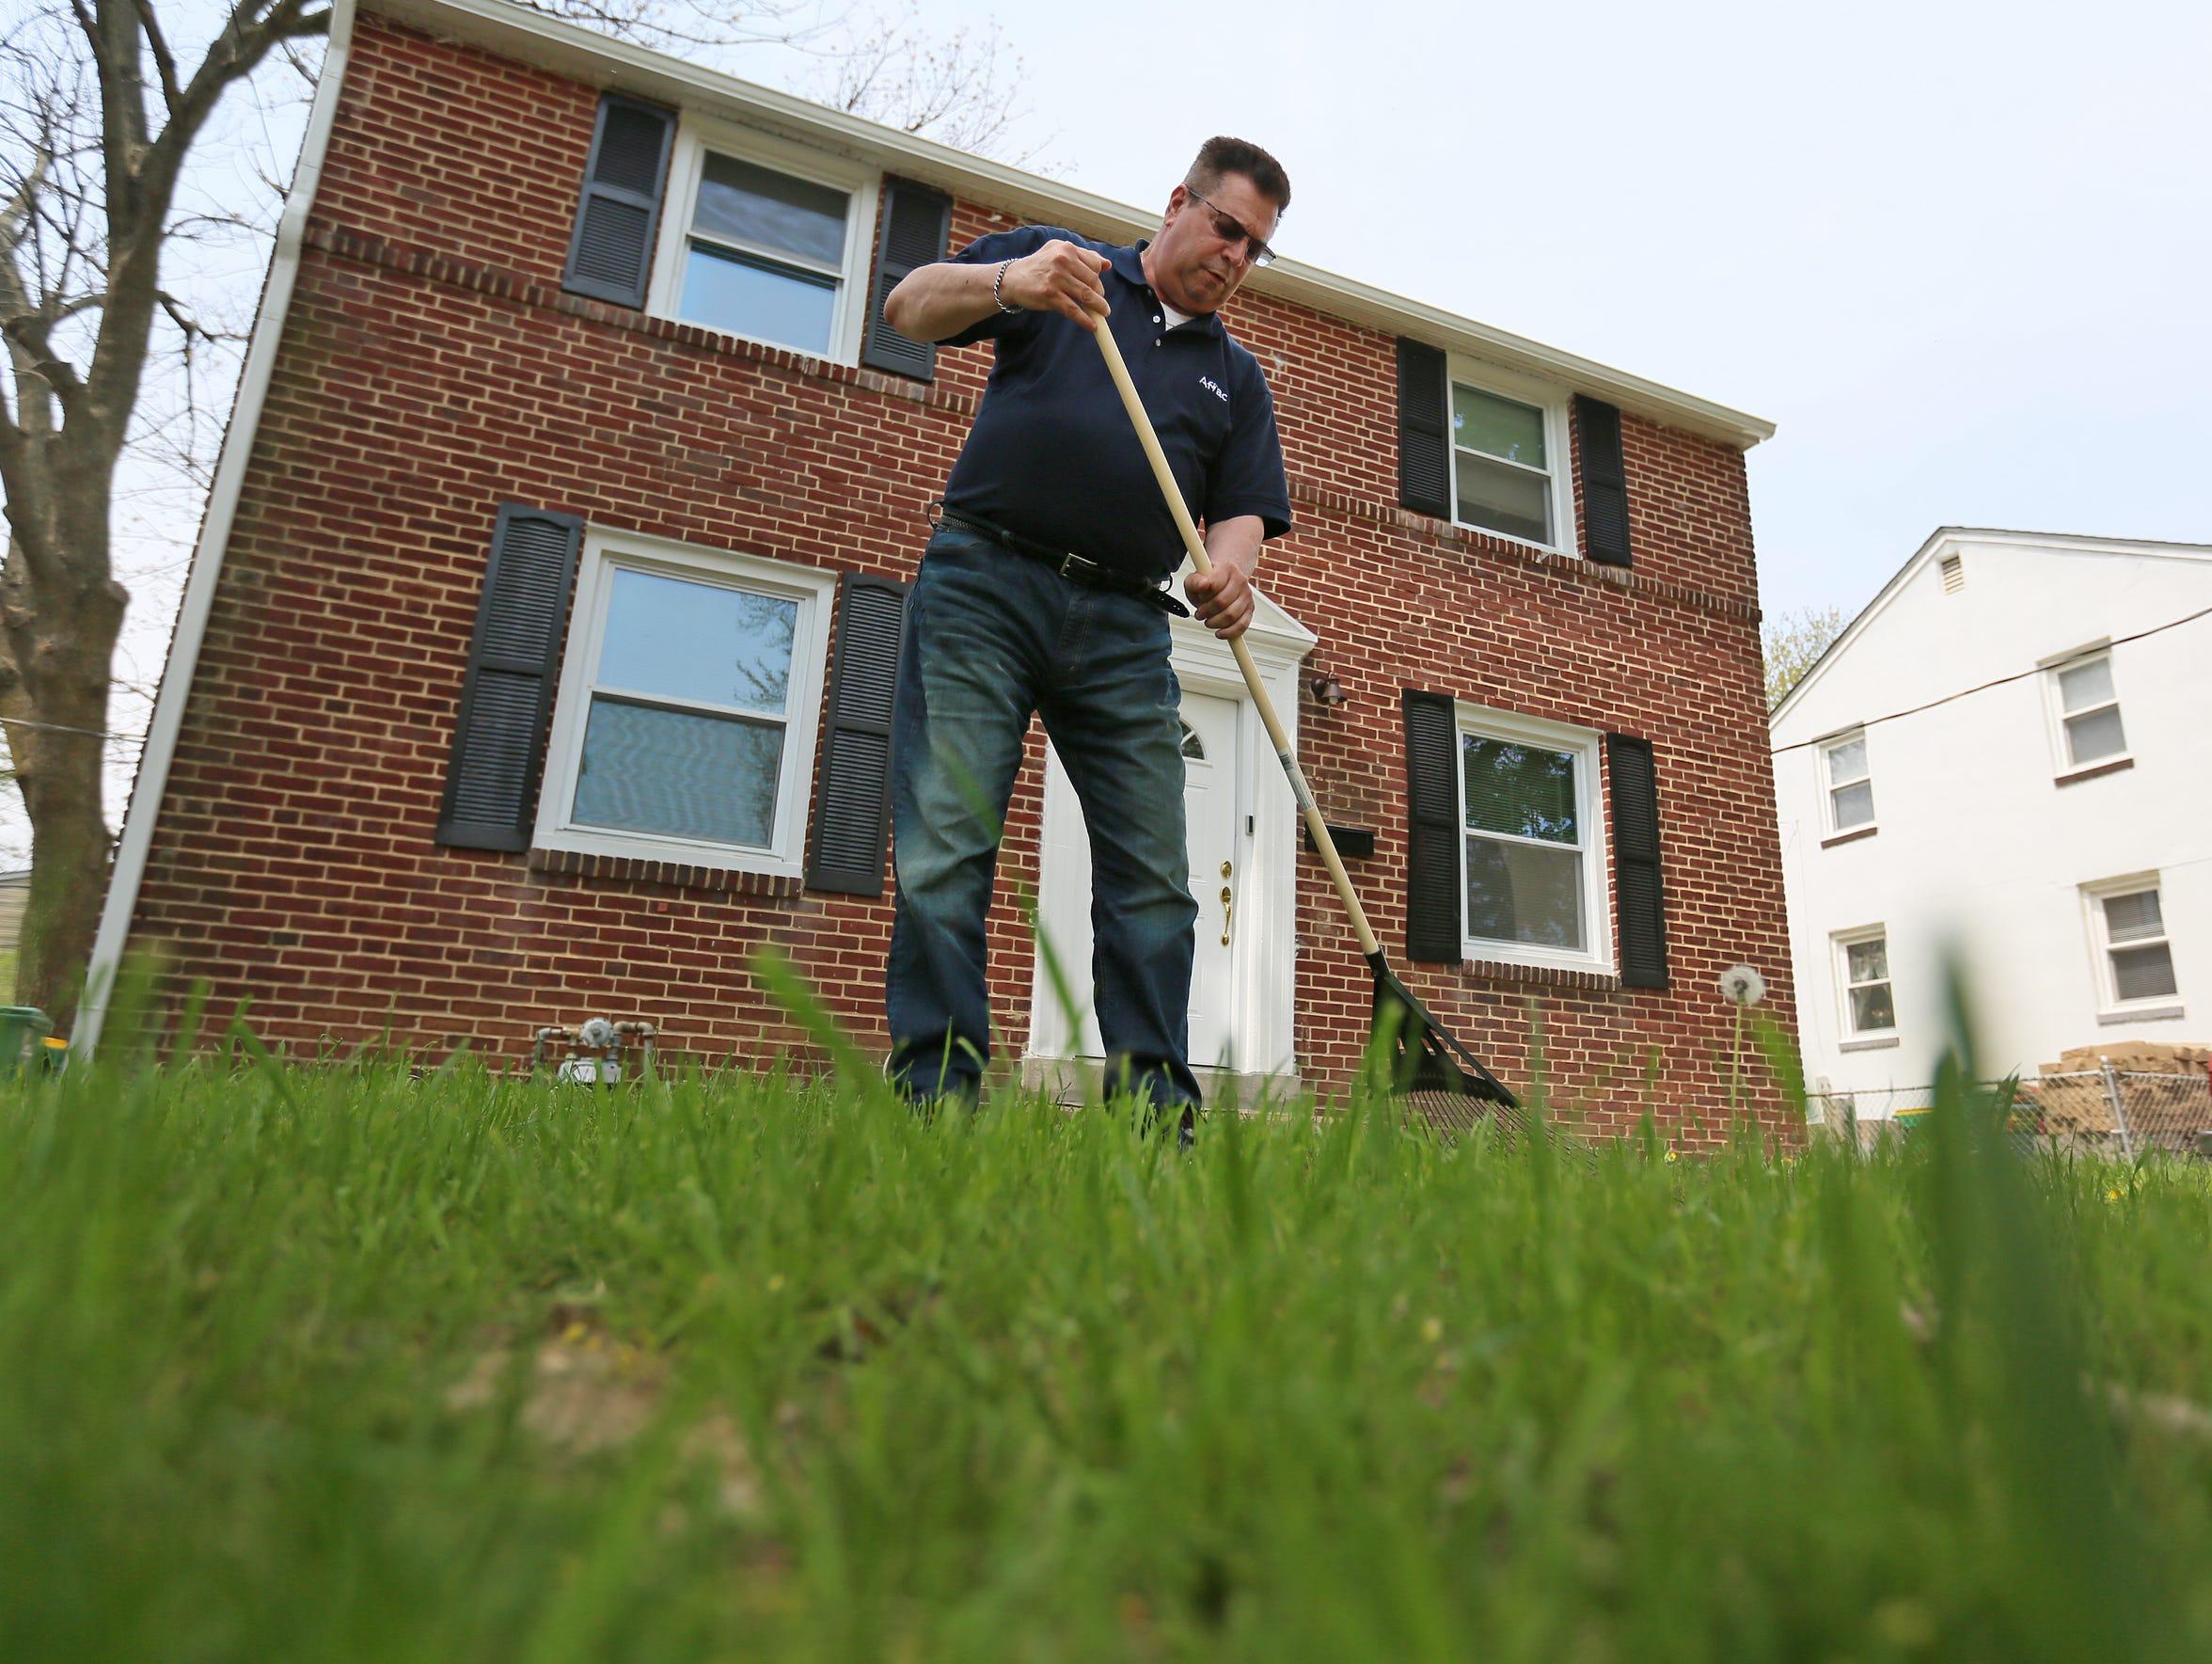 Ron Barisano, who has diabetes, rakes the lawn of his